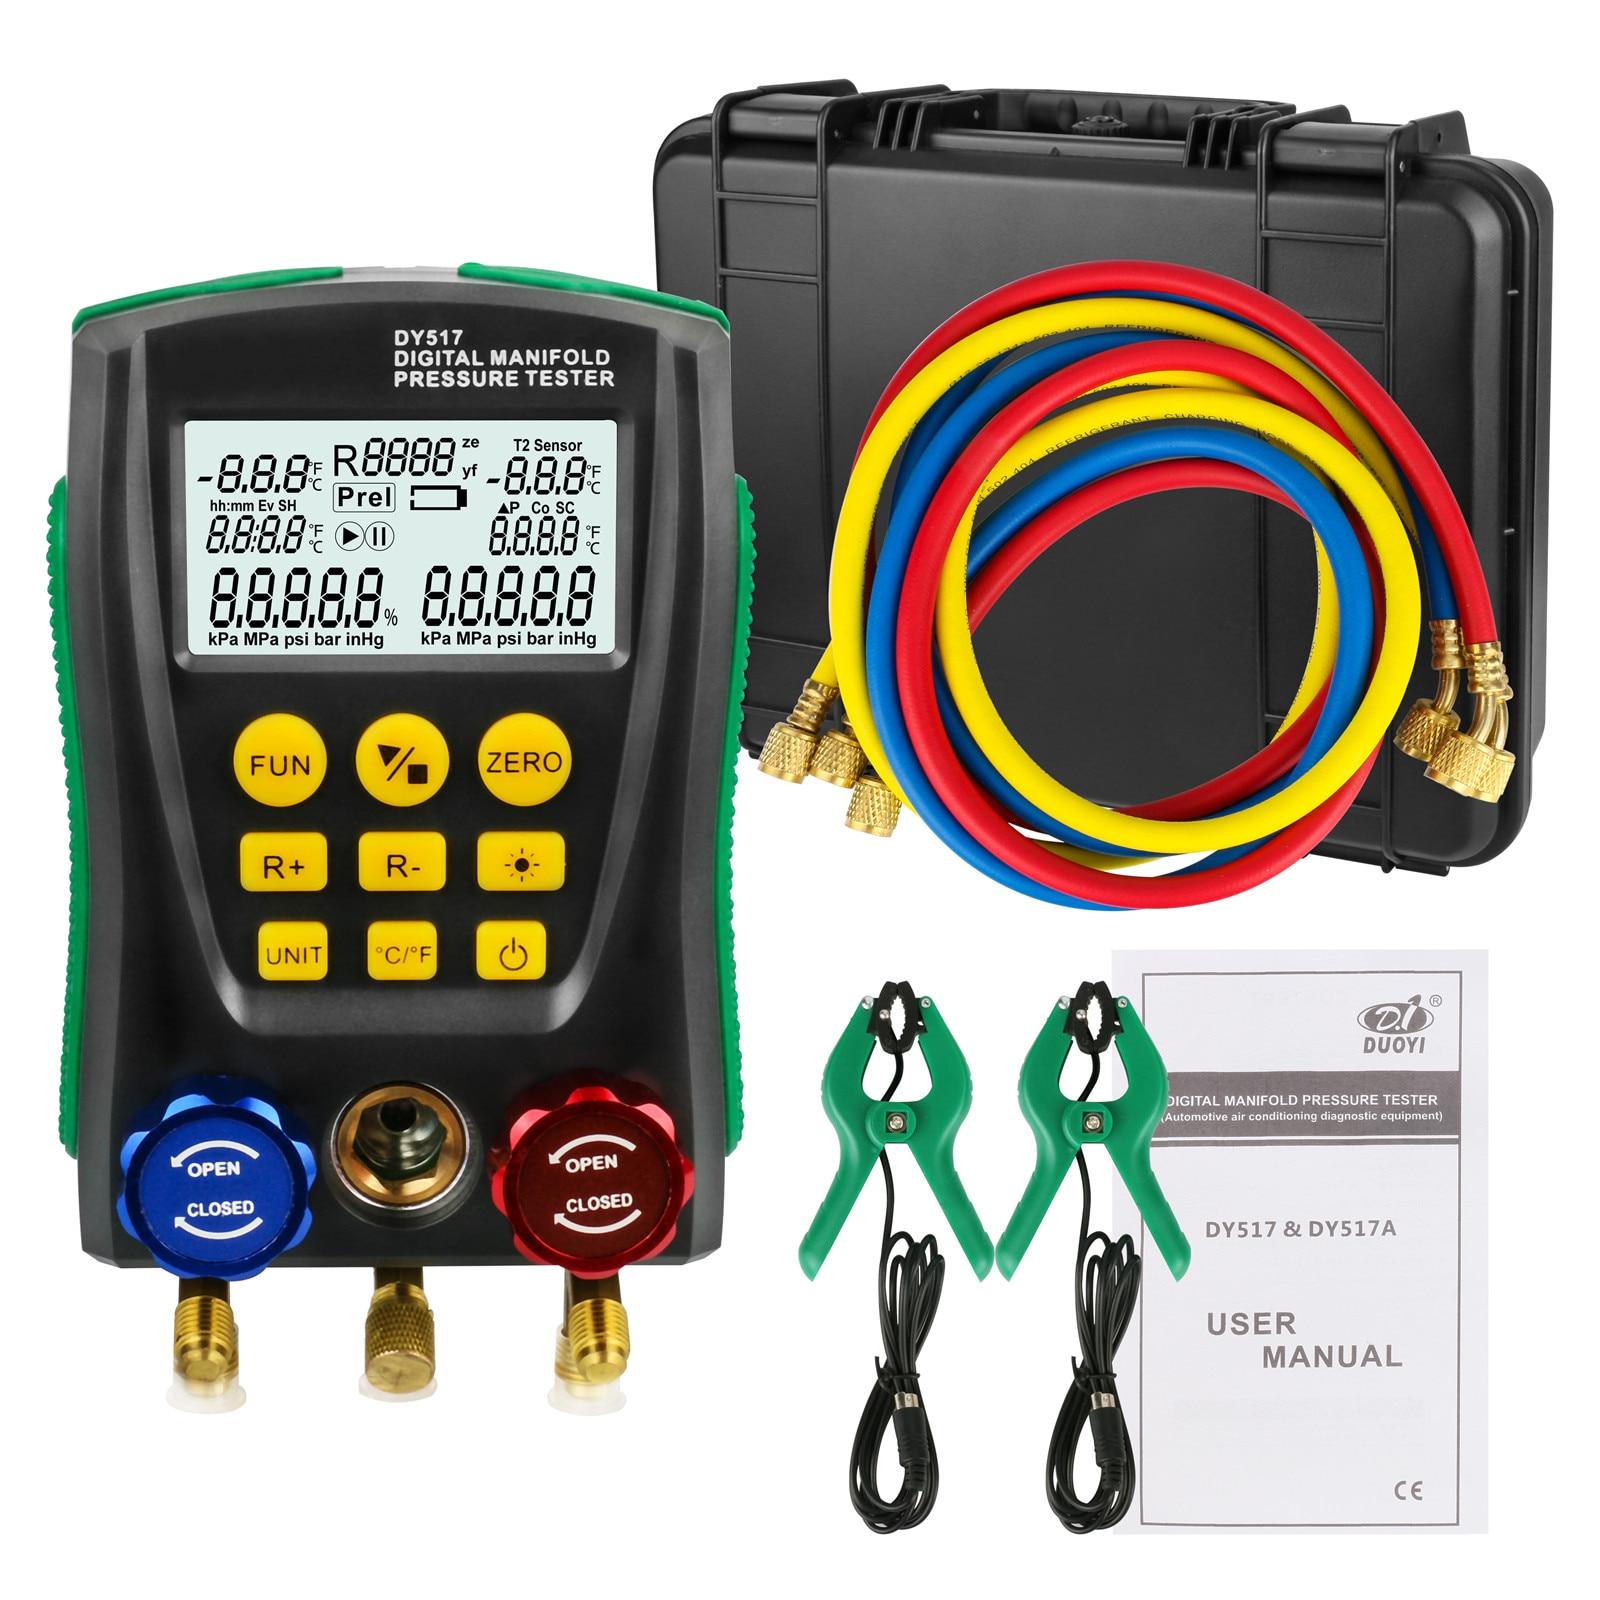 DY517A Refrigeration Digital Manifold Gauge Meter Refrigerant Inspection HVAC Vacuum Pressure Temperature Tester 2-Way Valve